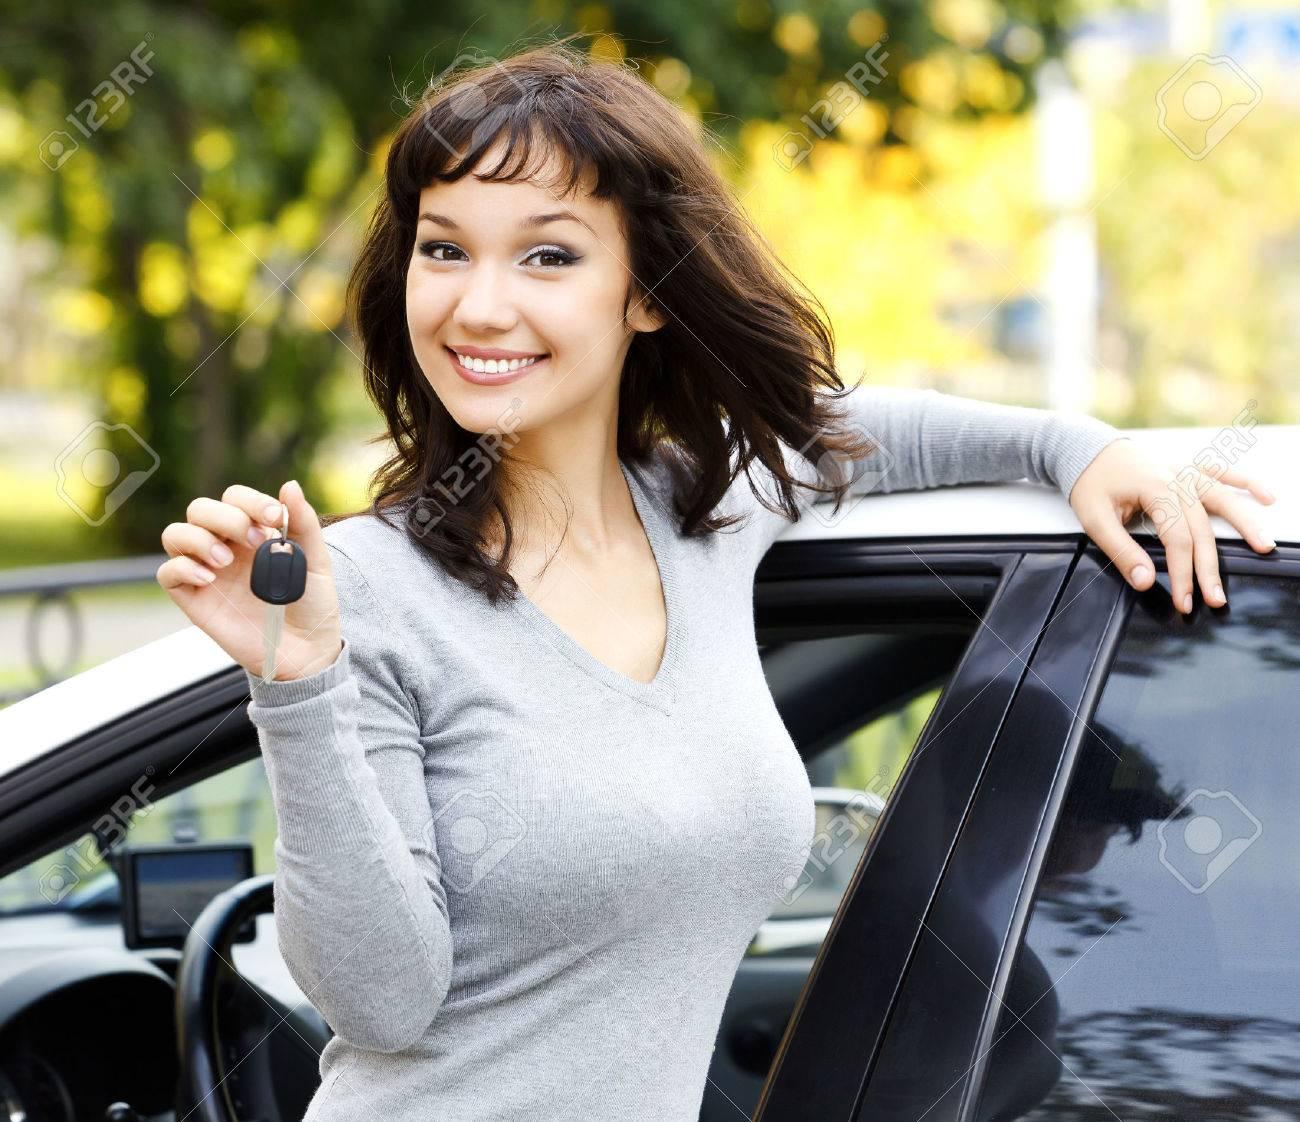 Pretty girl showing the car key - 38632370